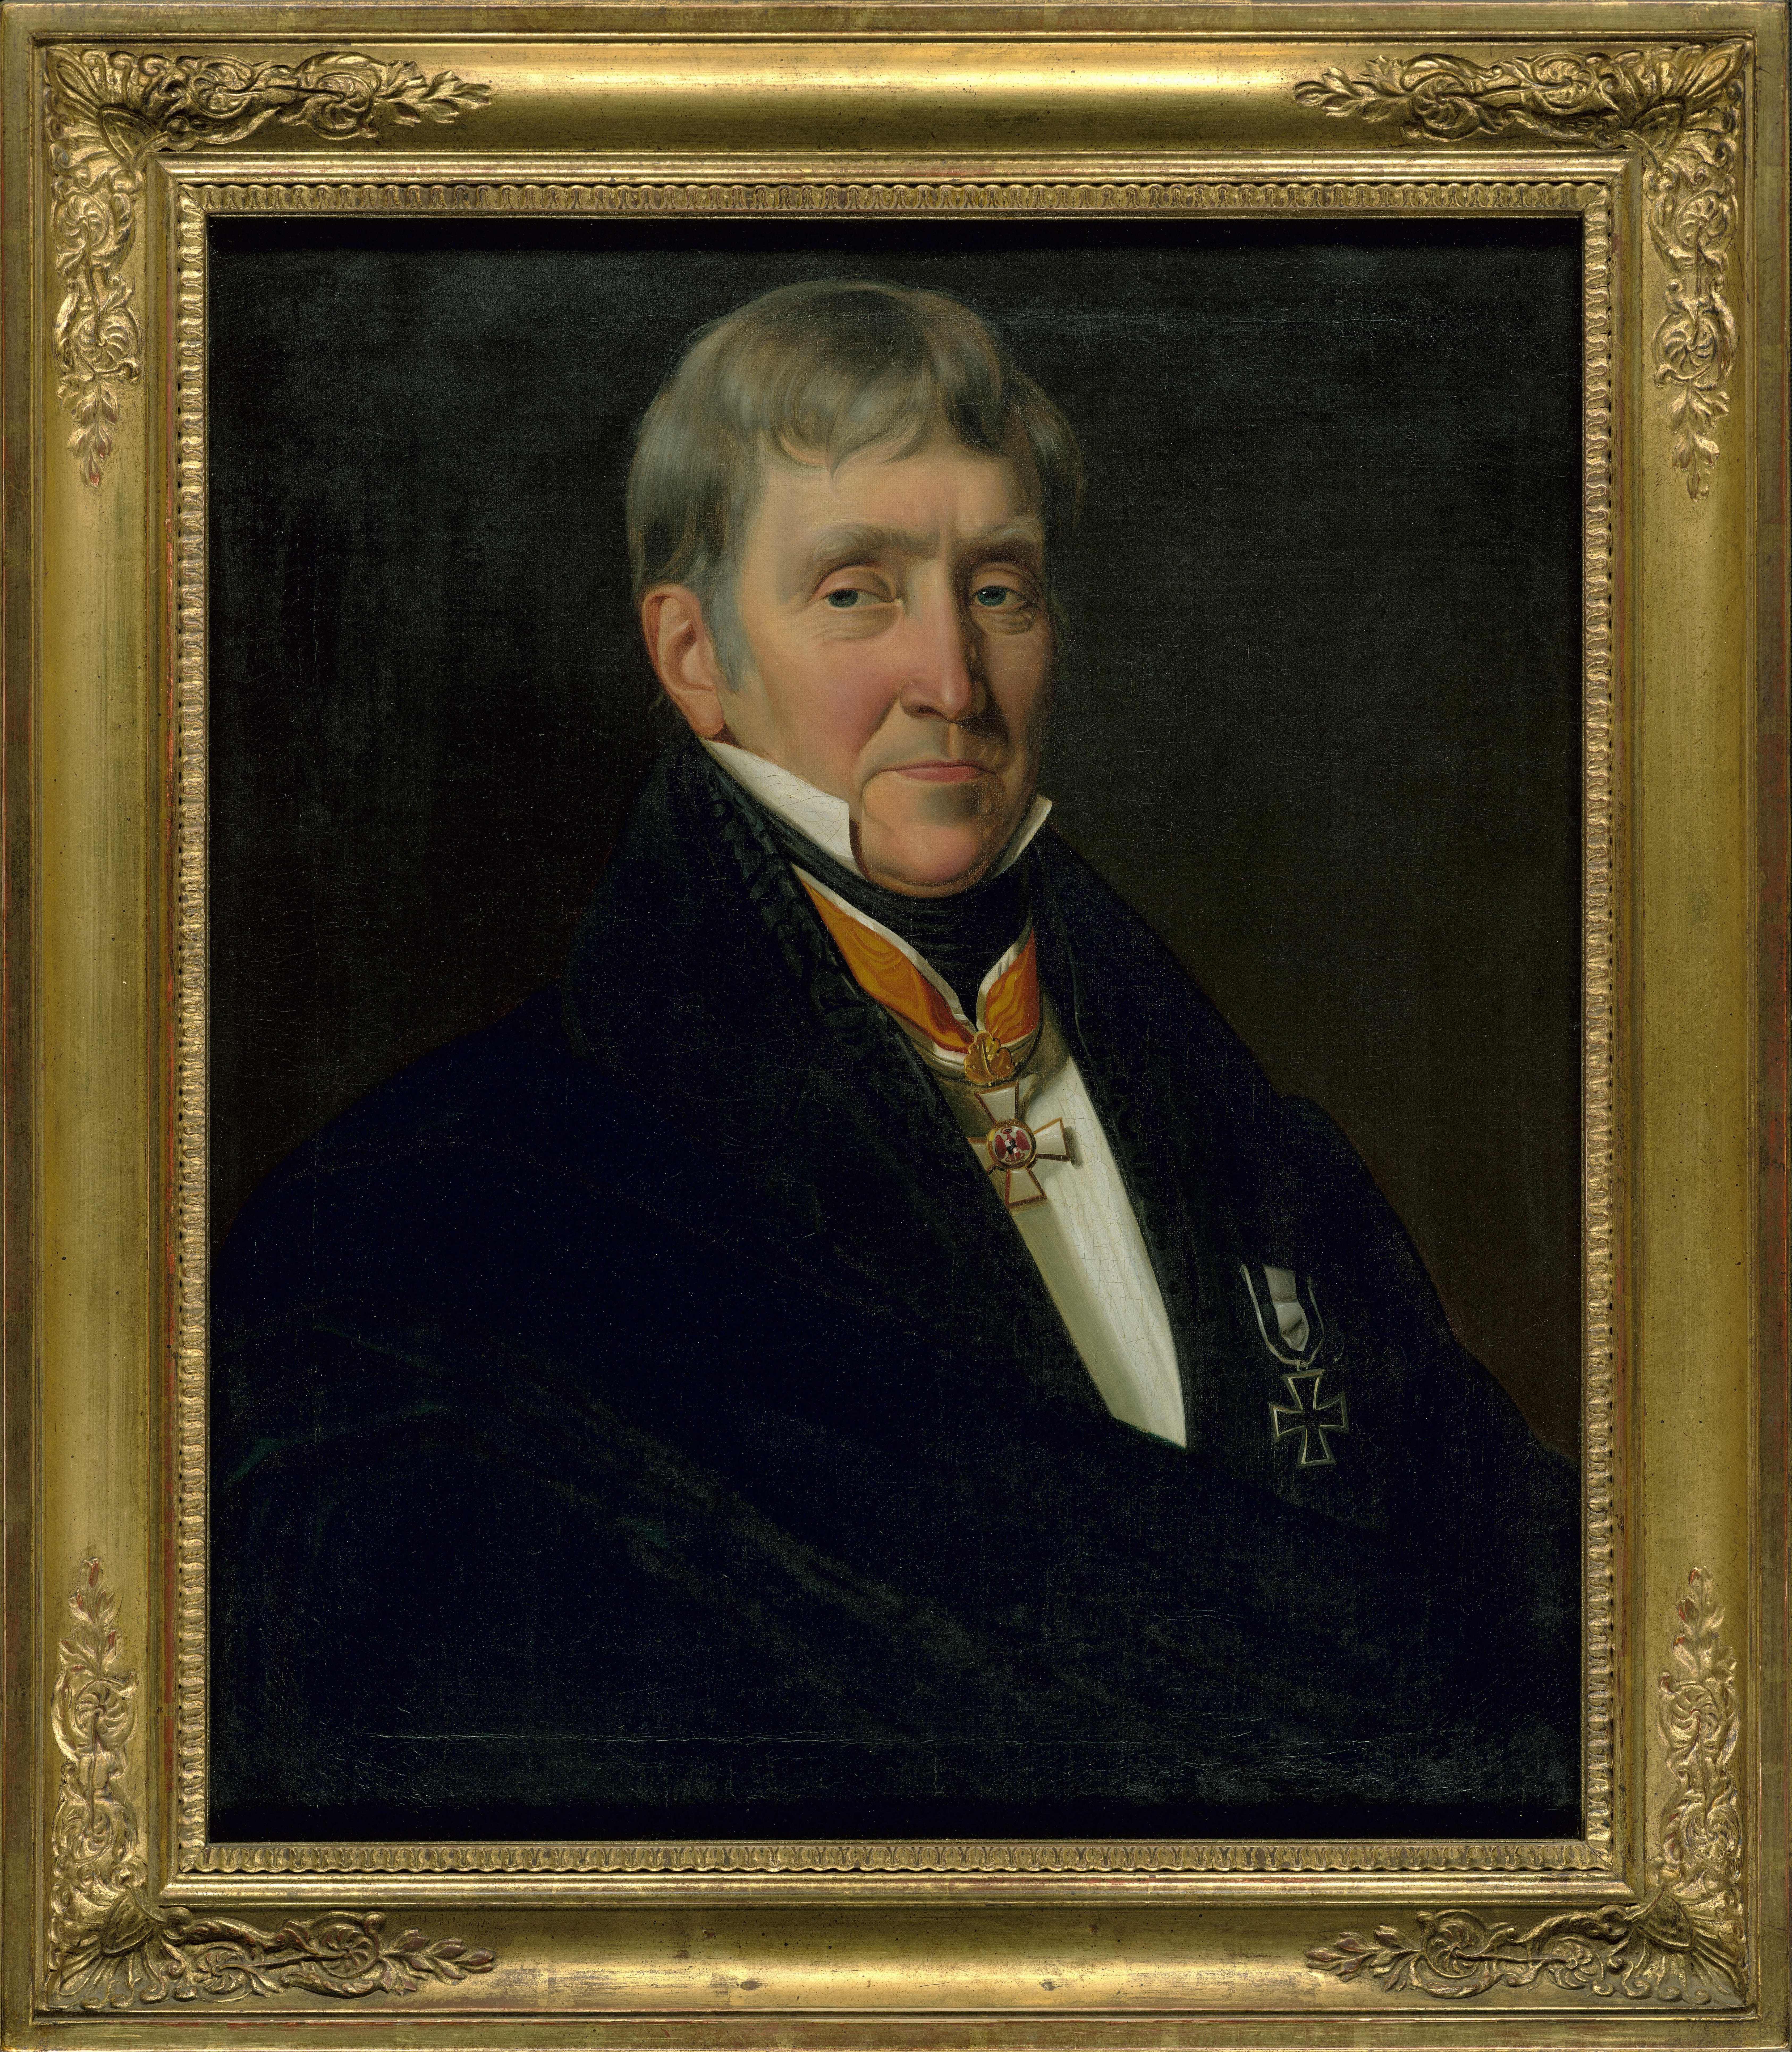 Johann Heinrich Richter, Porträt von Franz Gerhard Wegeler, 1839, 63 × 53 cm; Beethoven-Haus Bonn